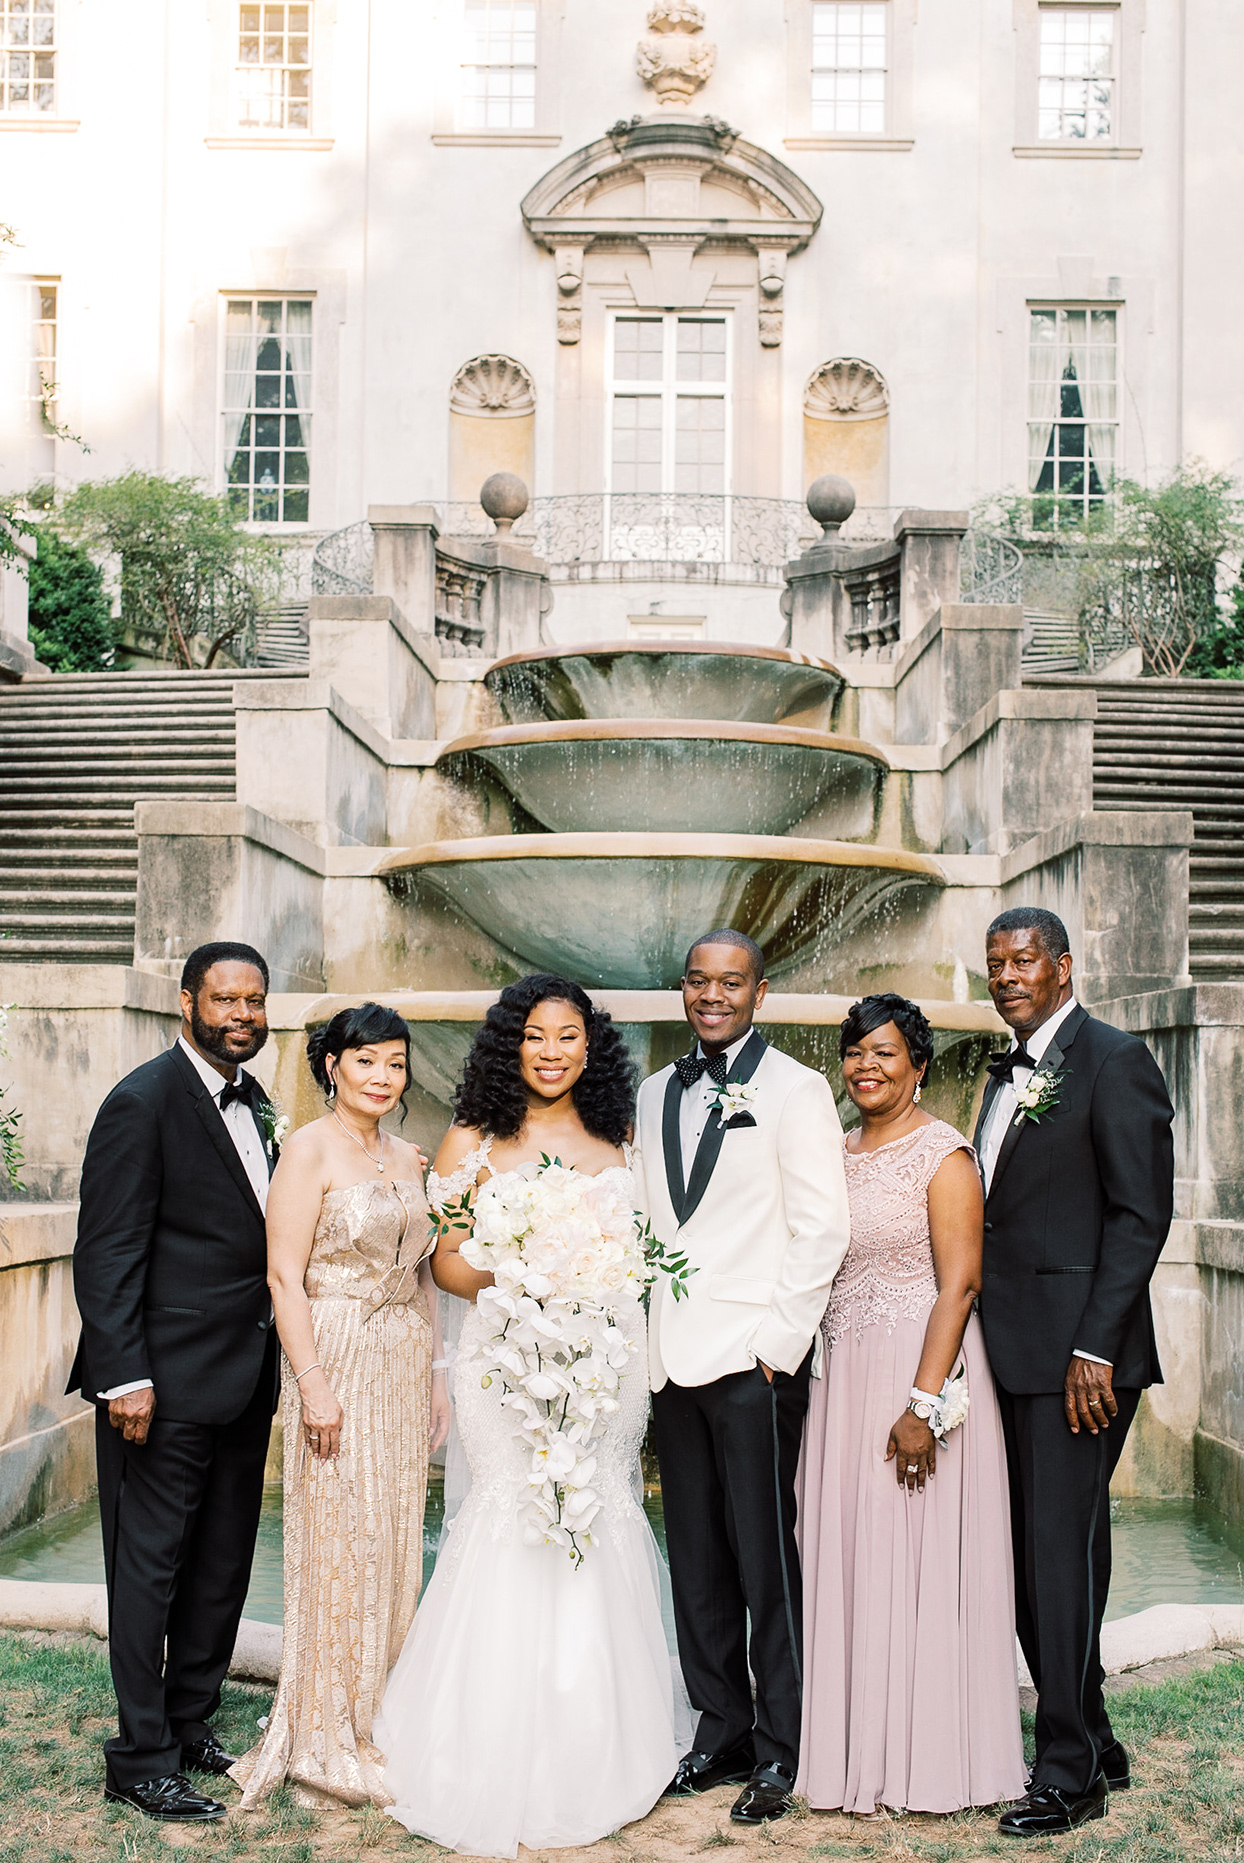 amelia justin wedding family portrait